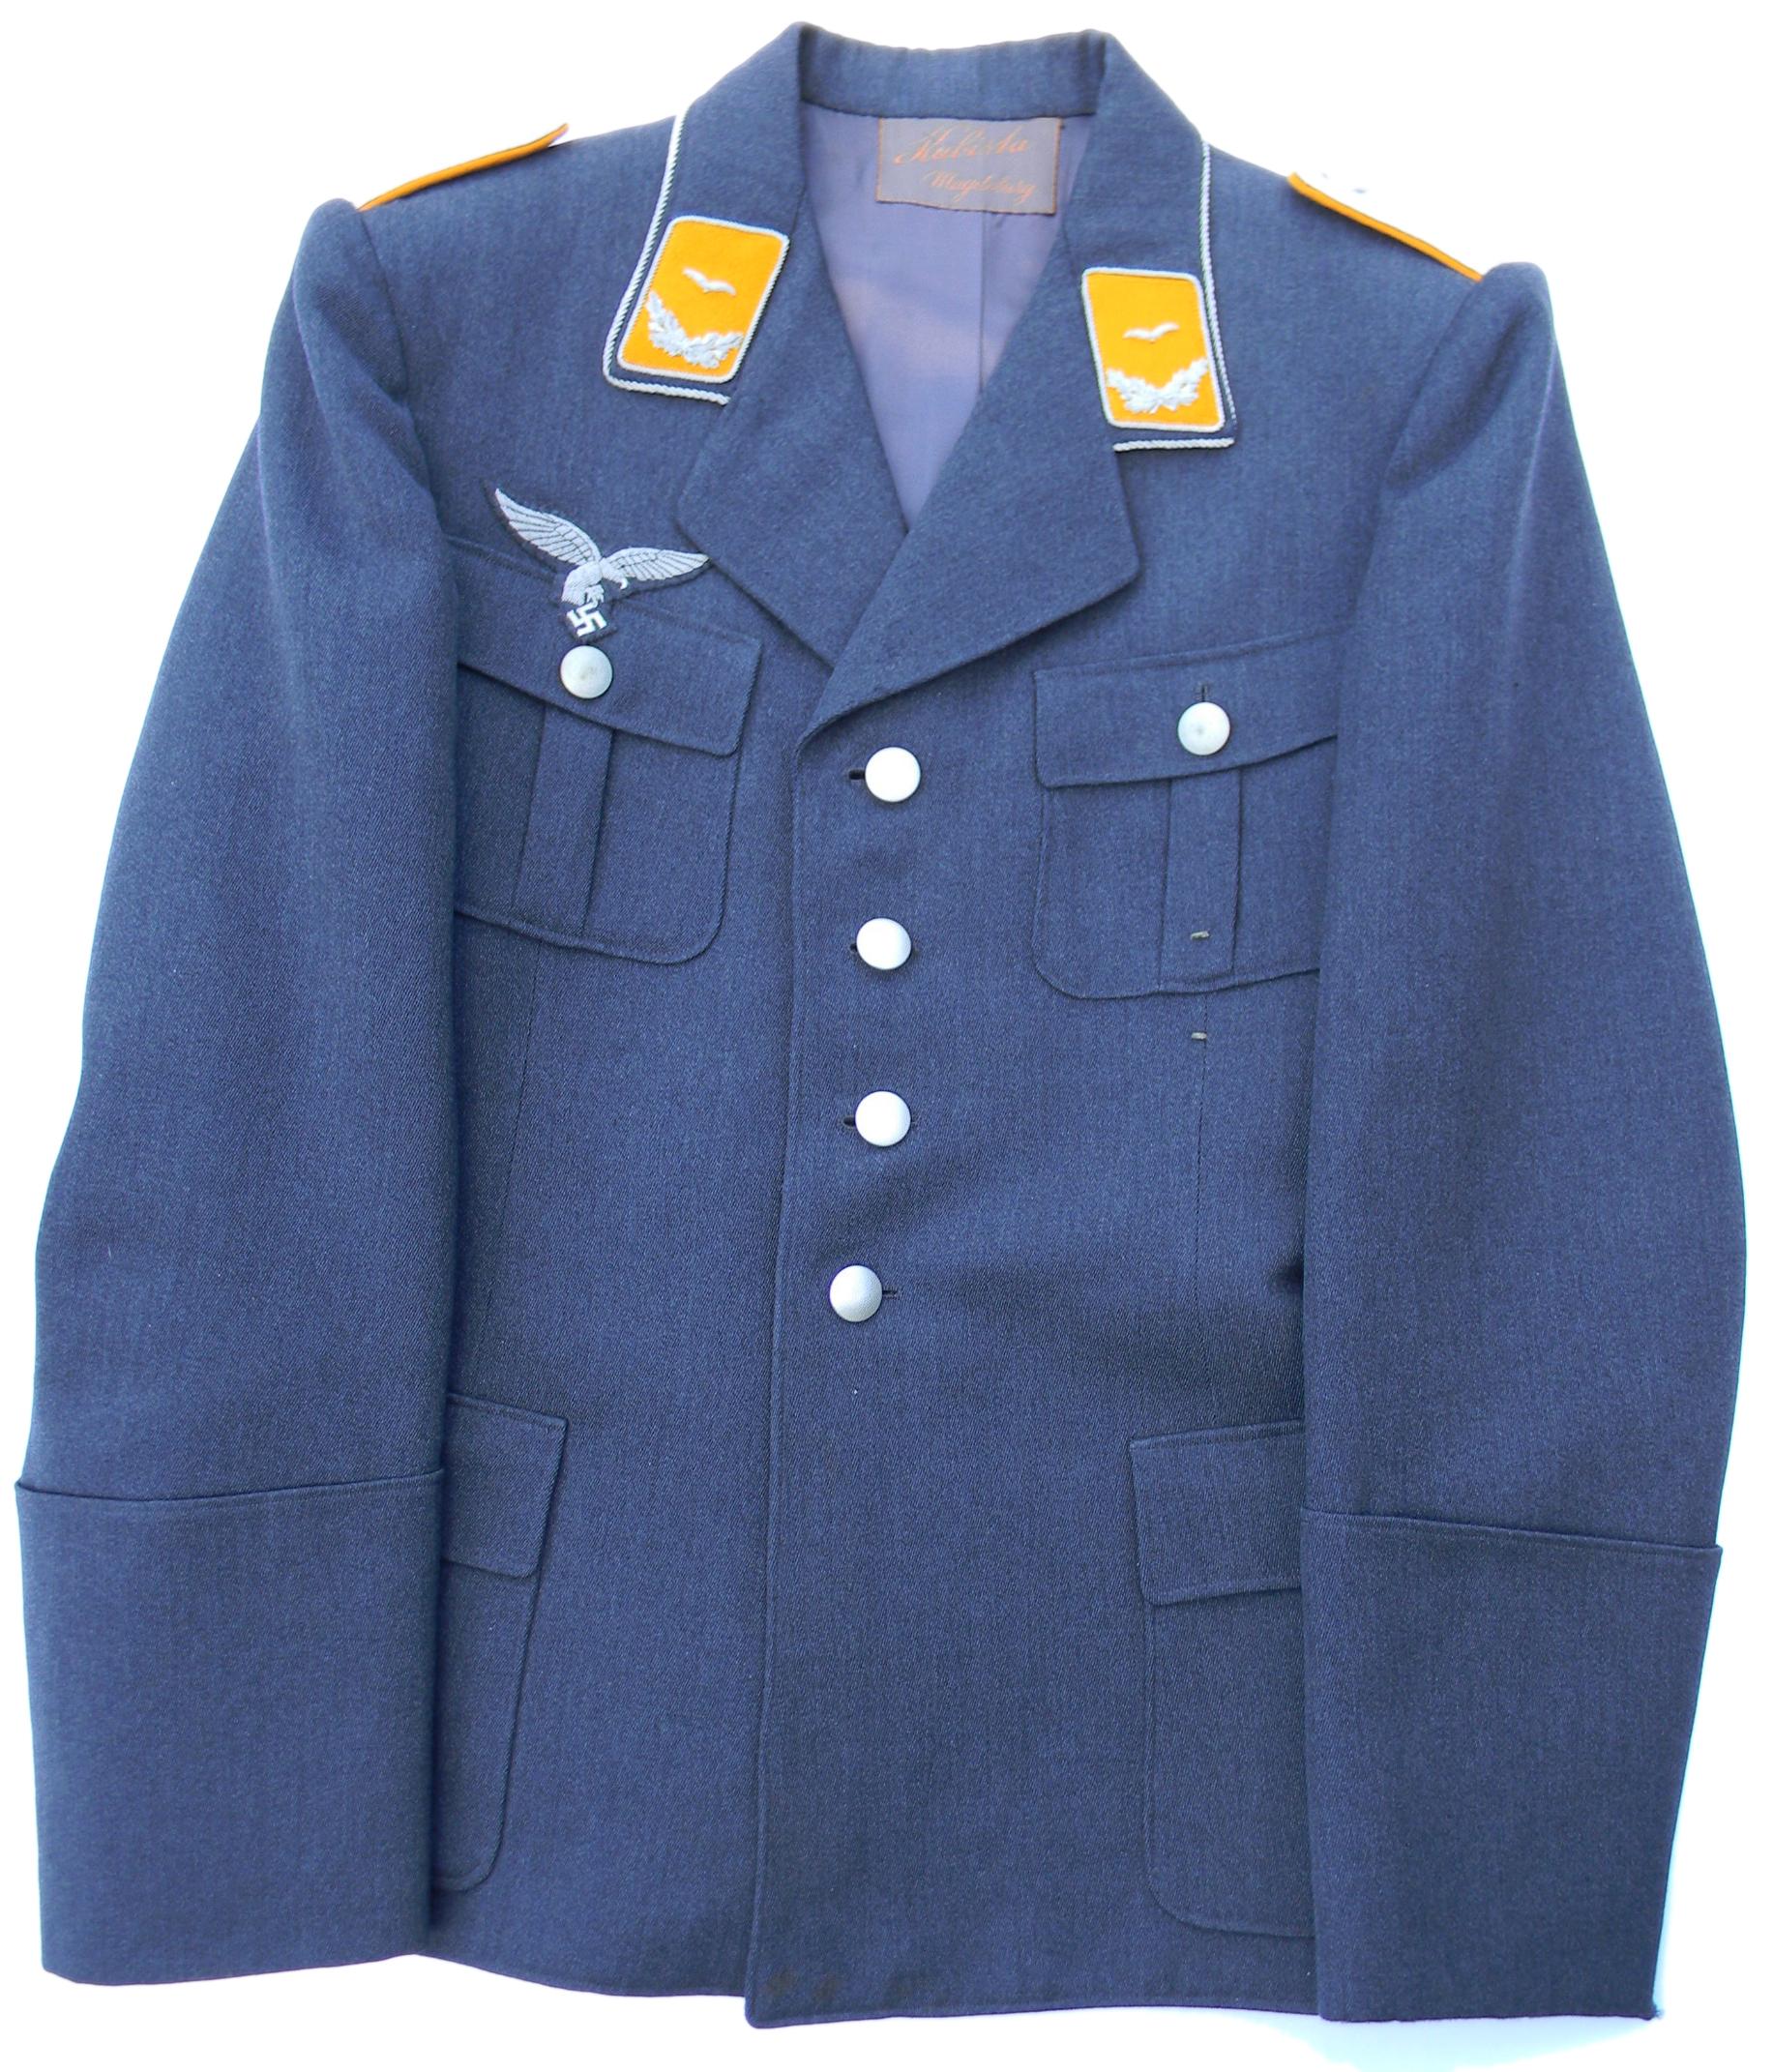 Luftwaffe officer's tunic